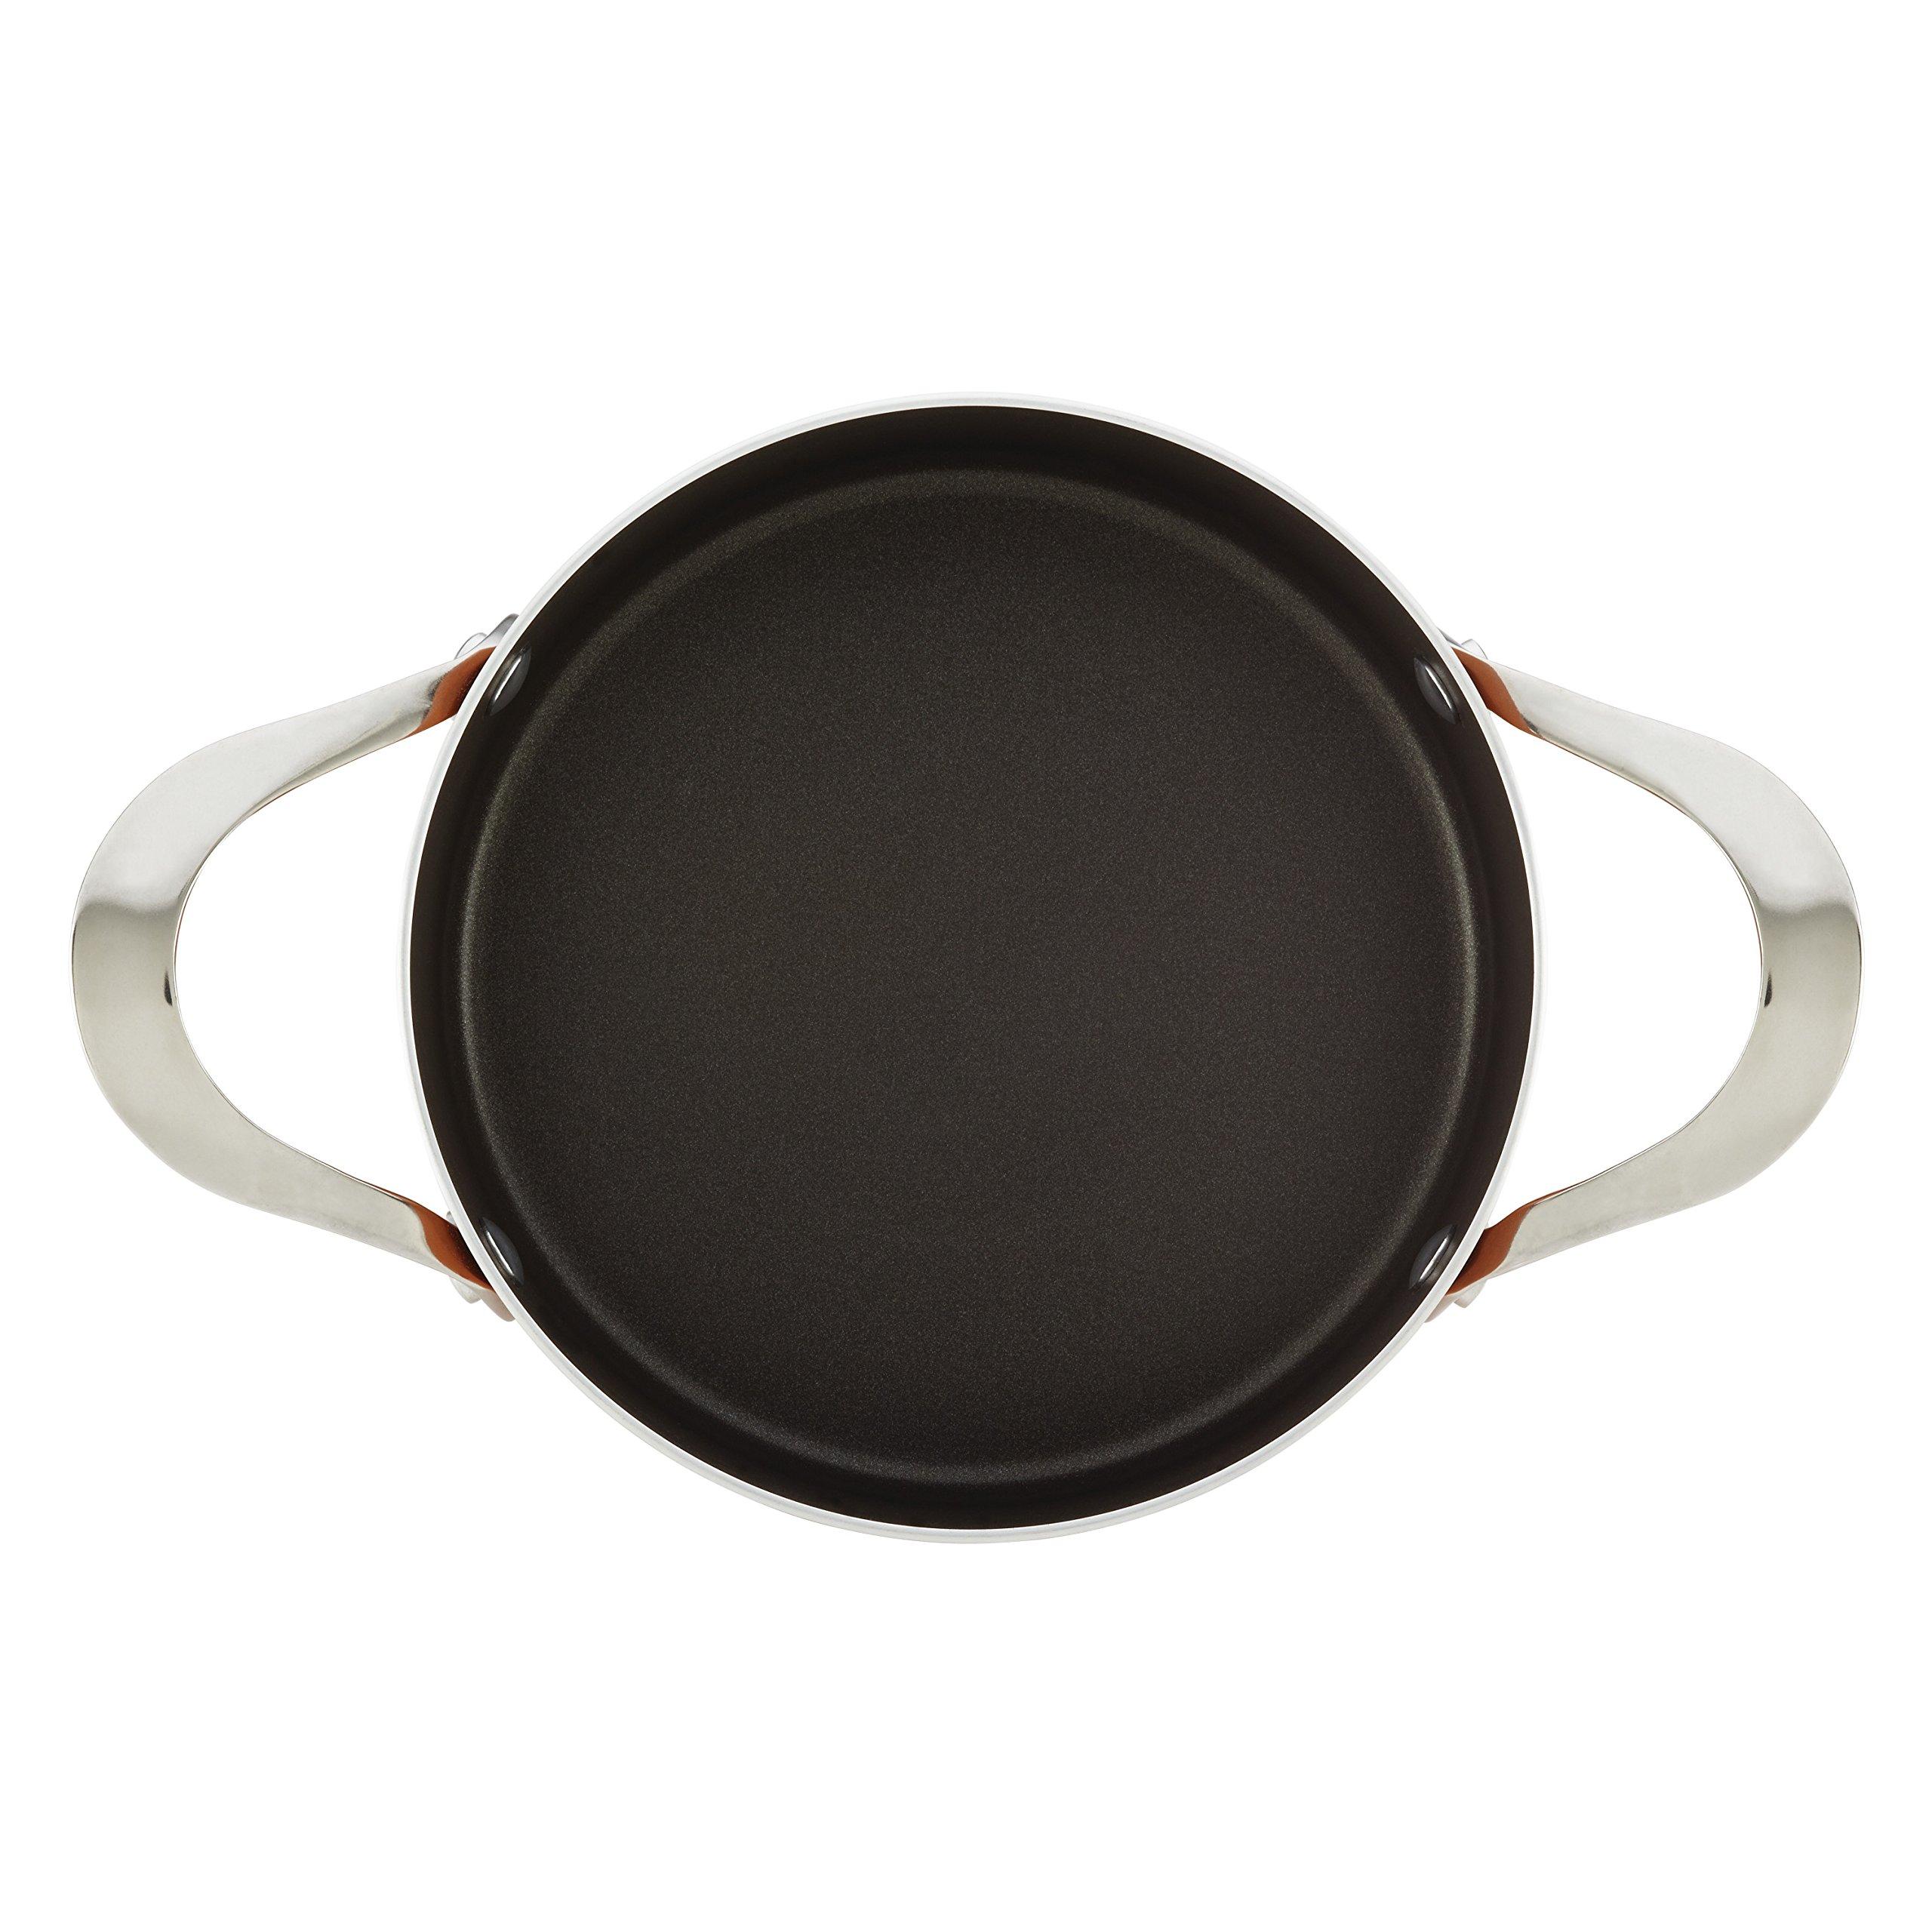 Rachael Ray Cucina Hard Porcelain Enamel Nonstick Covered Round Casserole, 2.5-Quart, Mushroom Brown by Rachael Ray (Image #9)